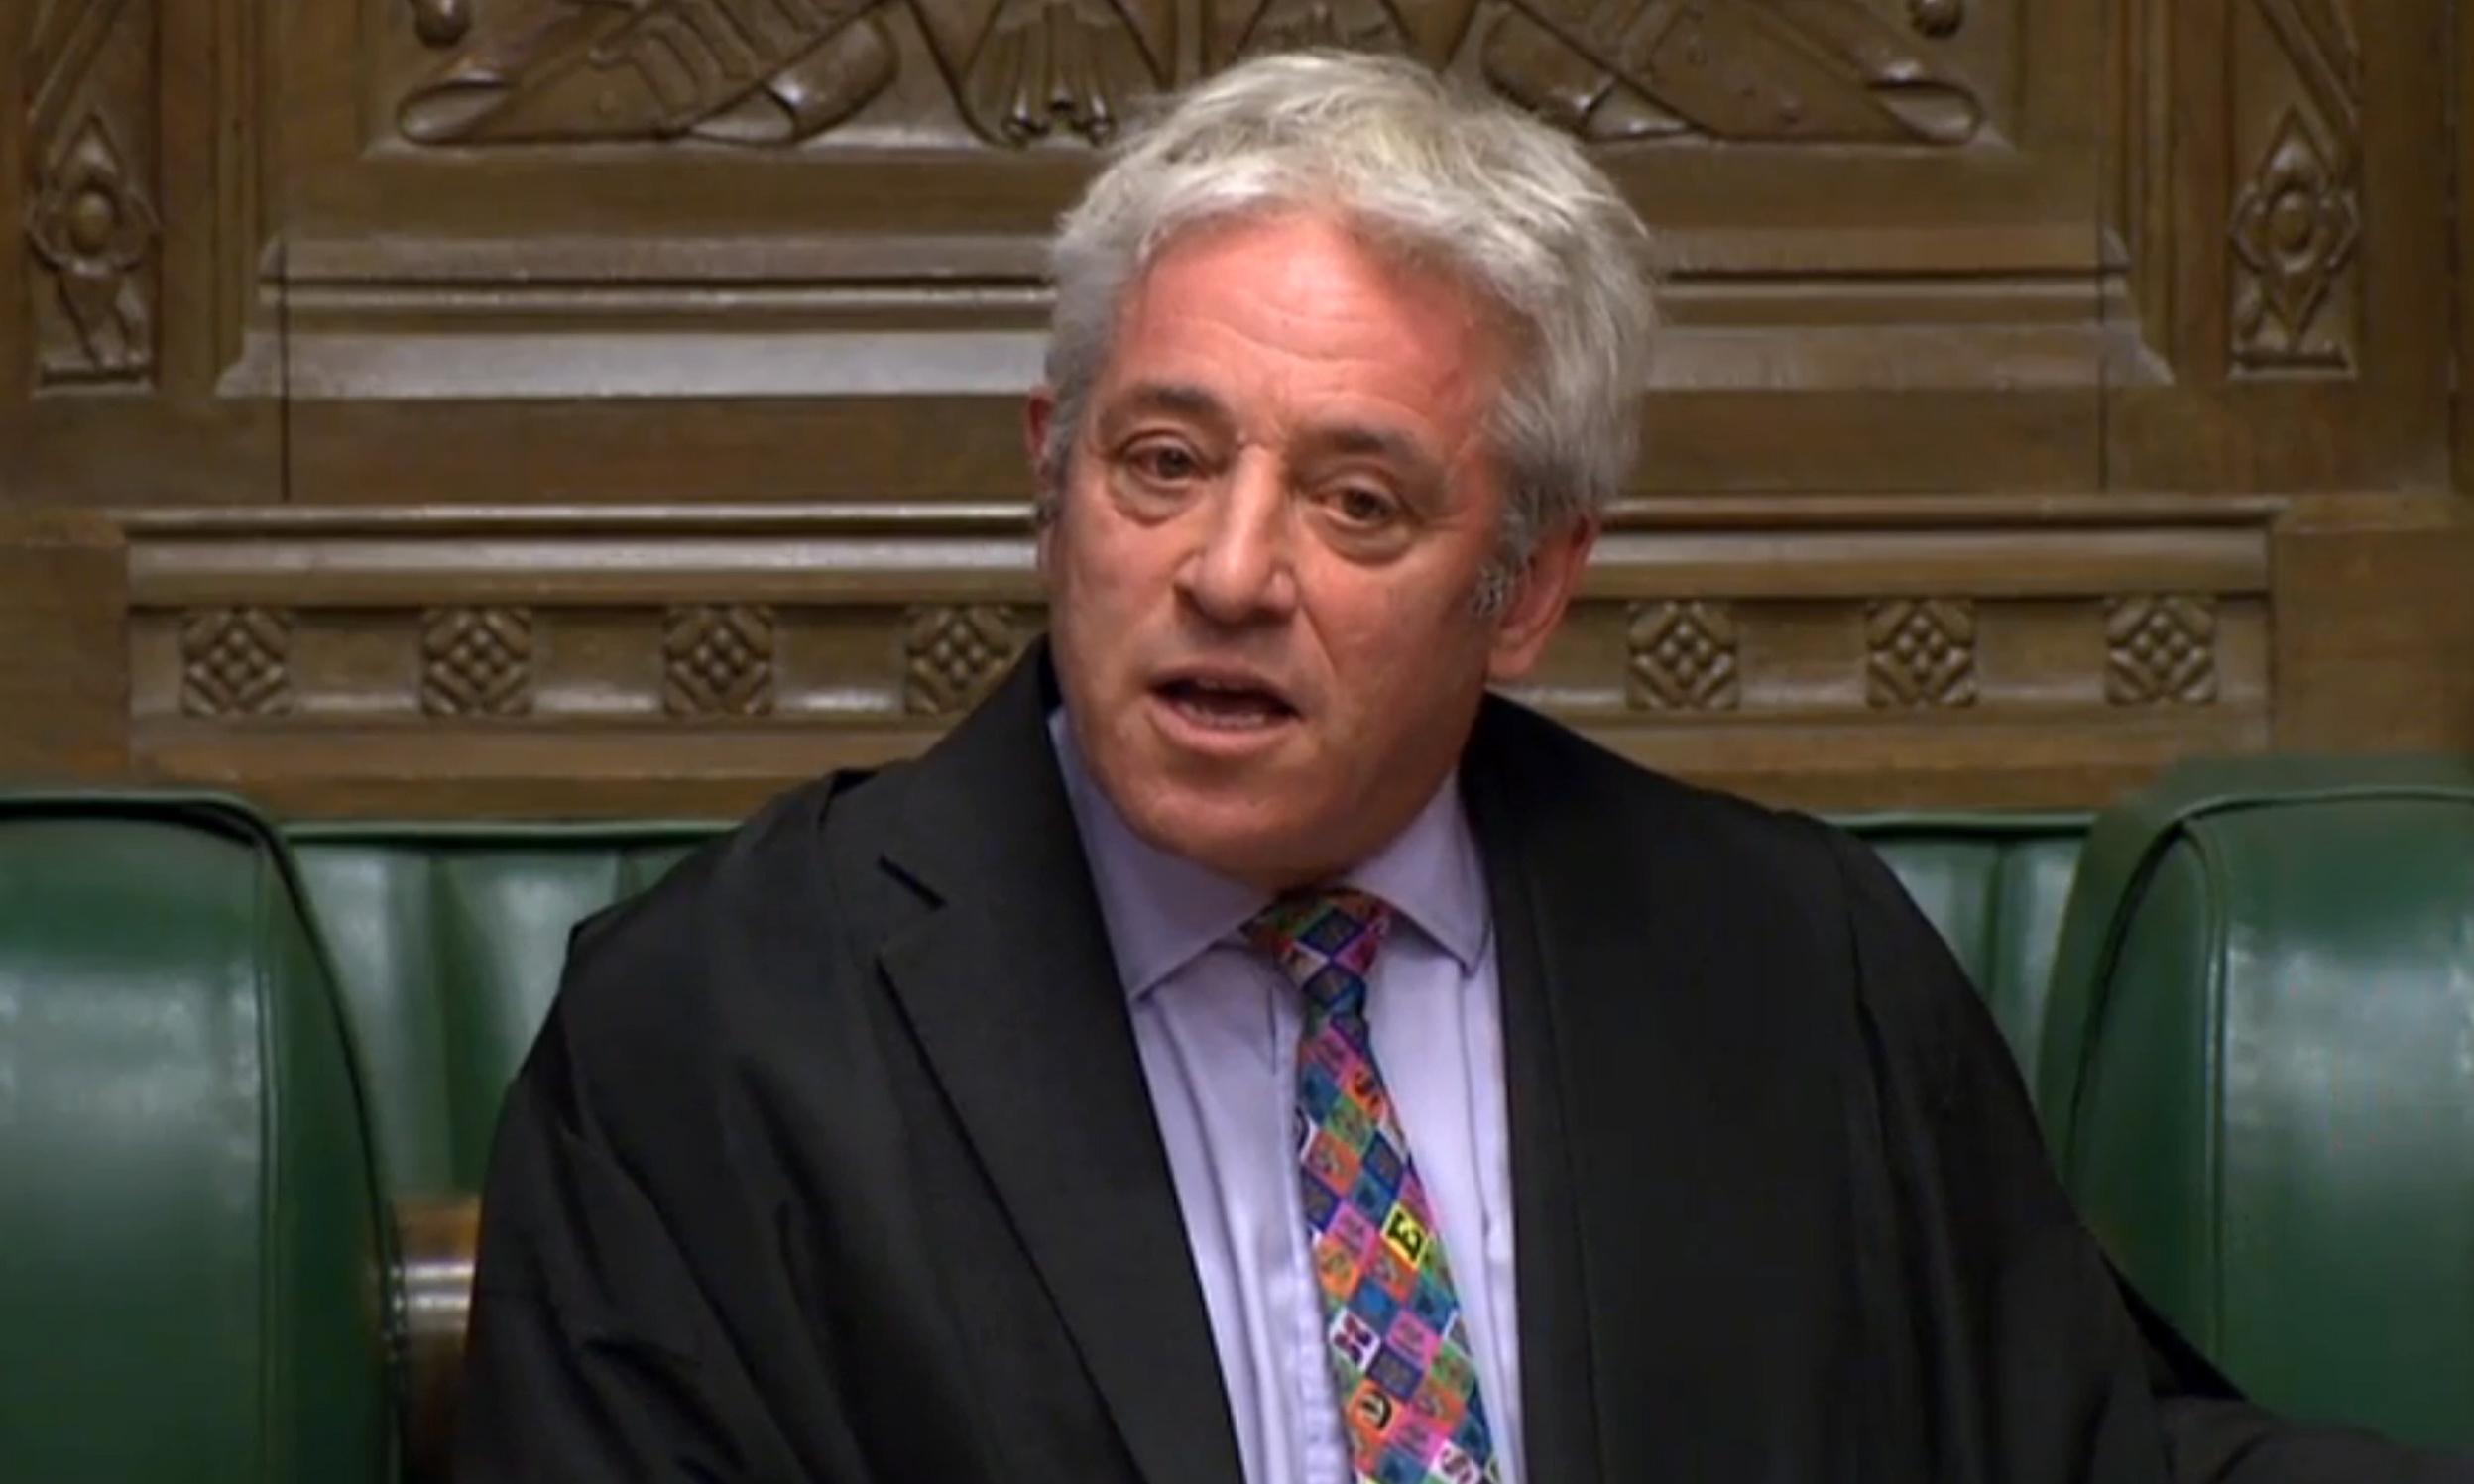 John Bercow denies Boris Johnson second vote on Brexit deal